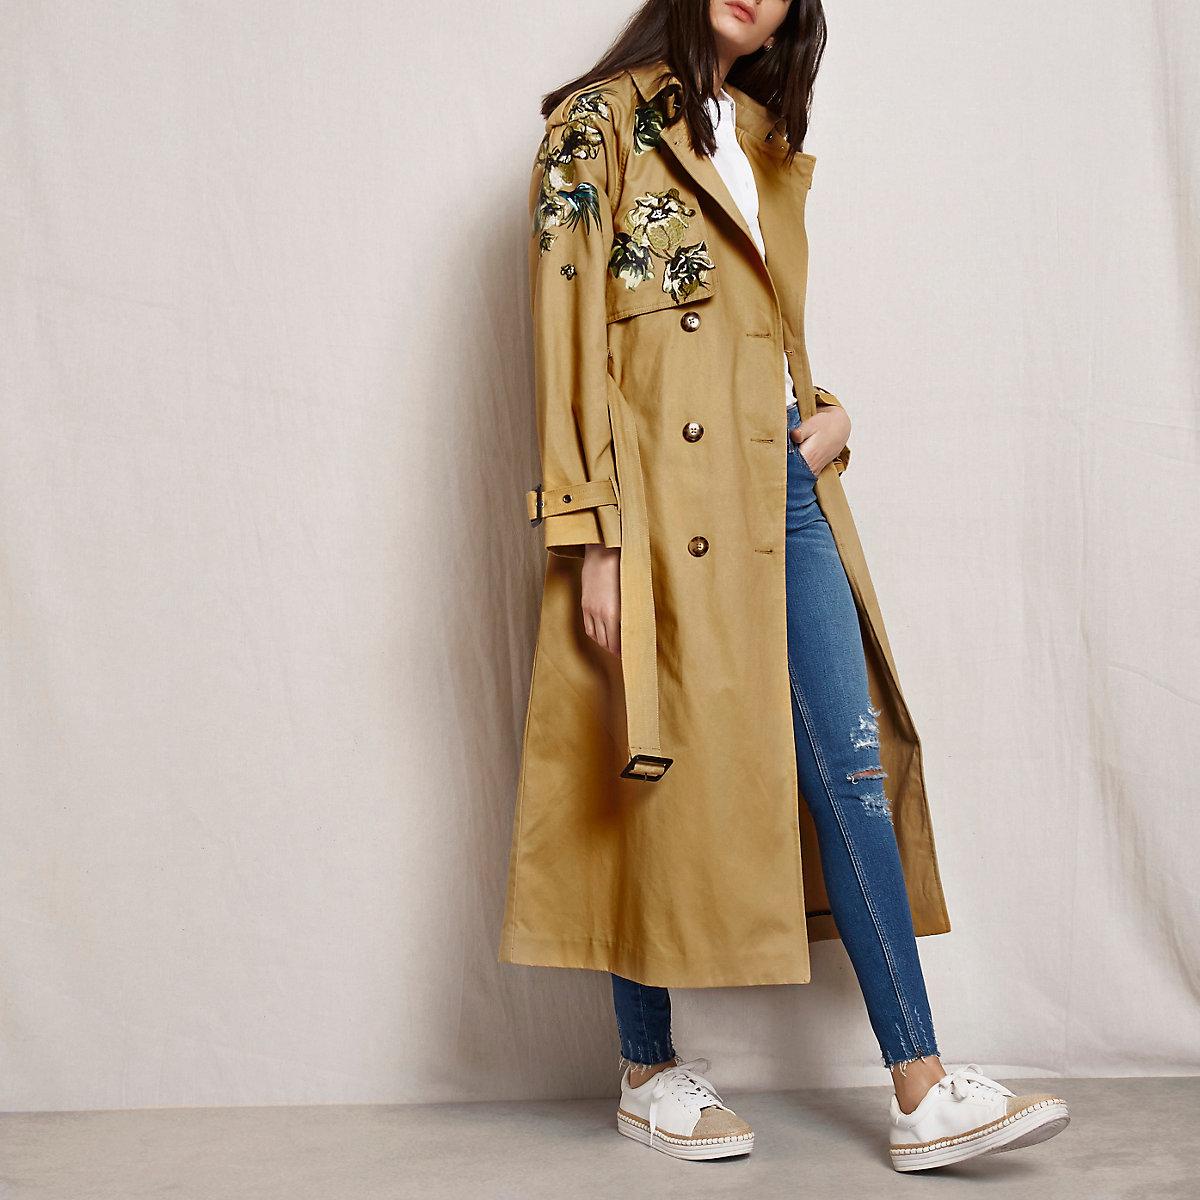 Tan RI Studio embroidered trench coat